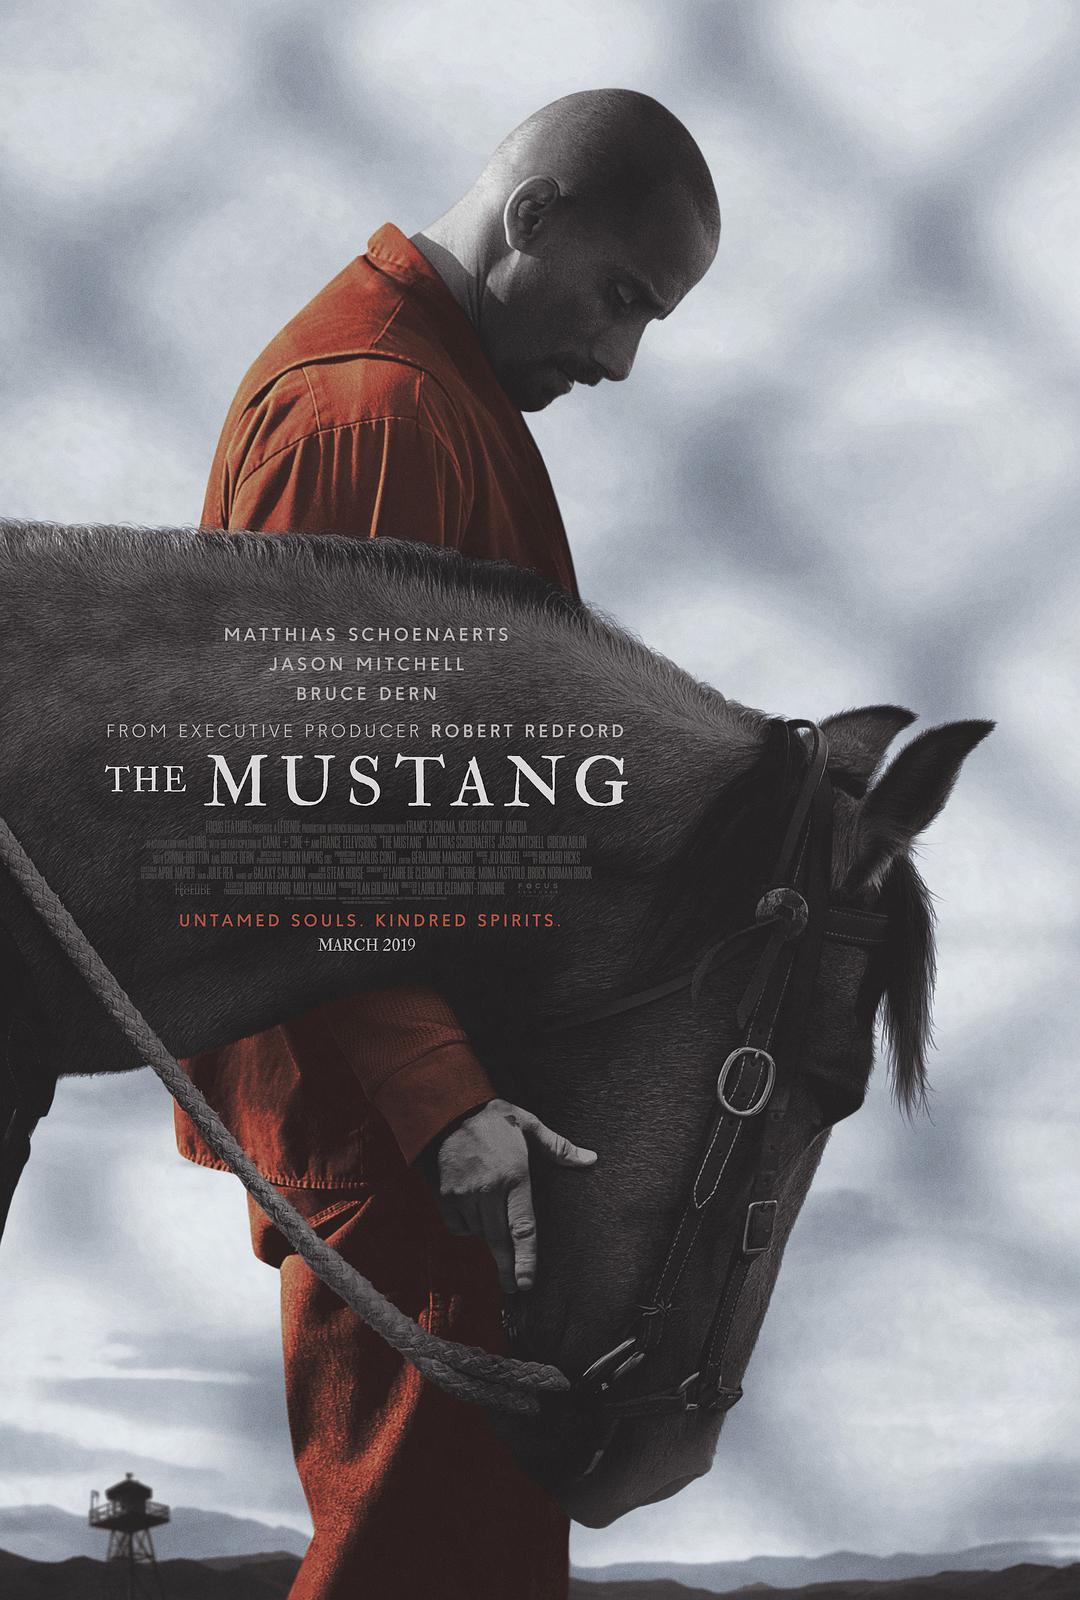 野马 蓝光原盘下载+高清MKV版 2019 The Mustang 30.4G